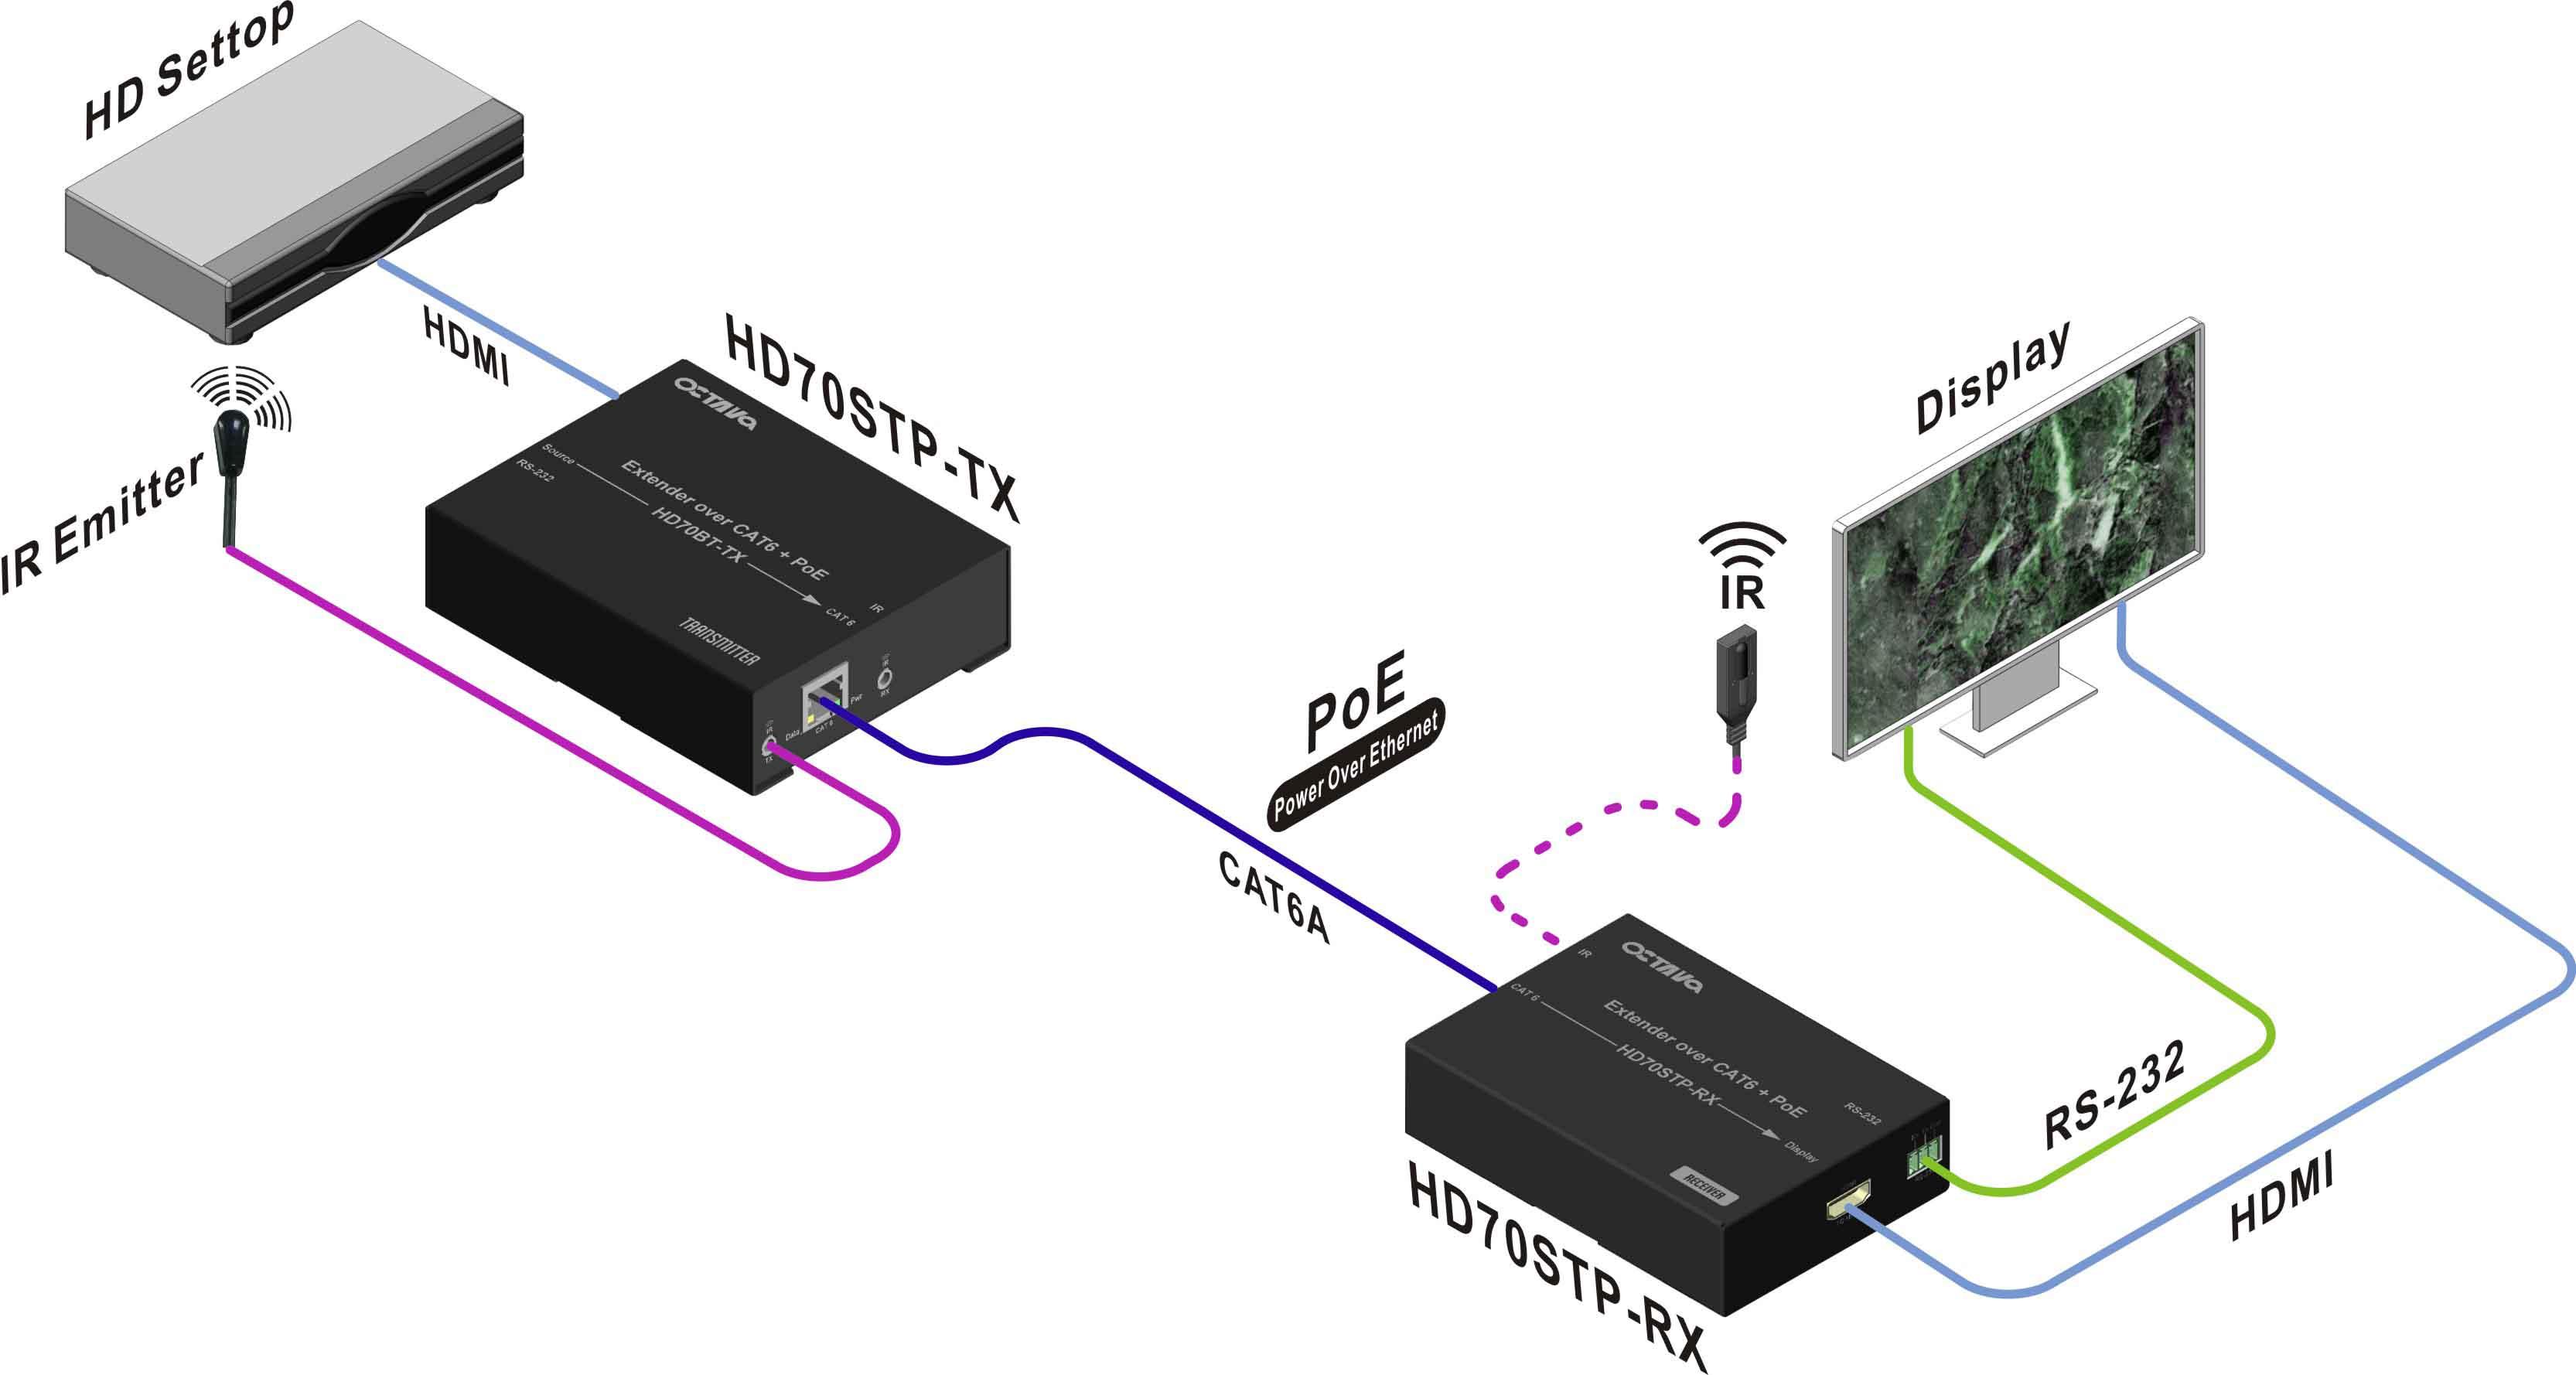 wireless extender diagram wiring ceiling fan light 3 way switch octava hd100stp  the media factory